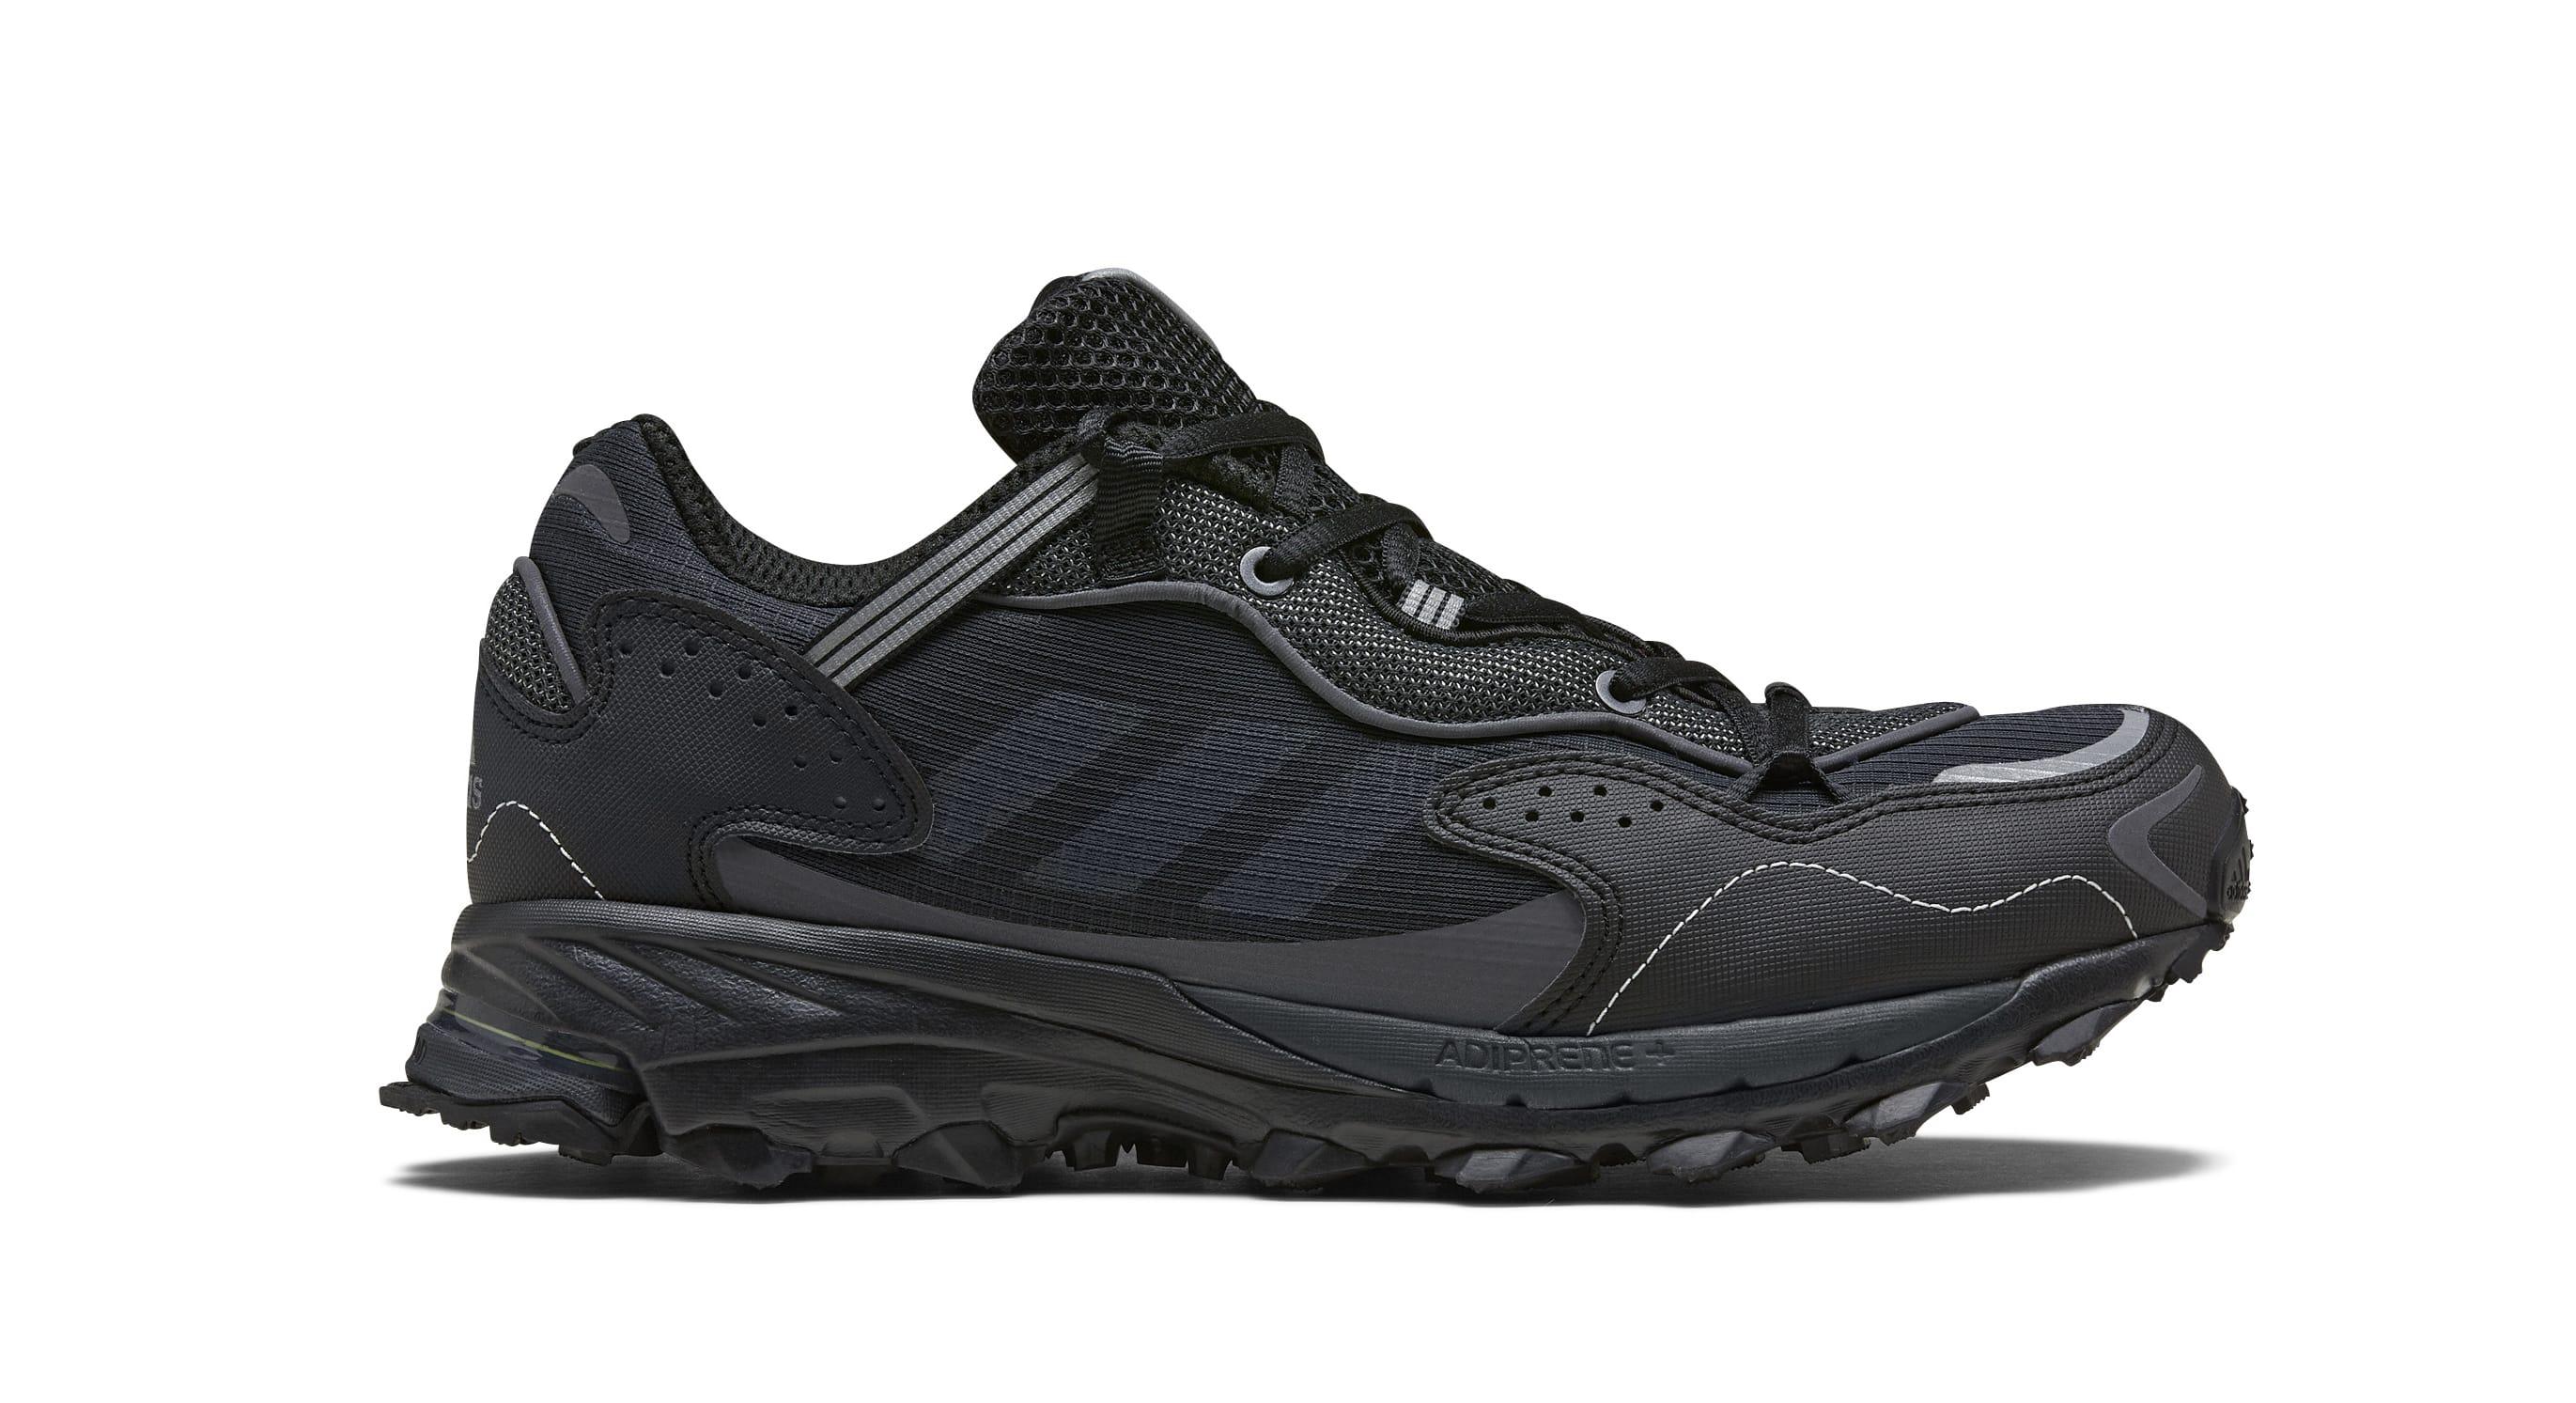 Adidas Gardening Club 2.0 Response Hoverturf Black FX4153 (Lateral)